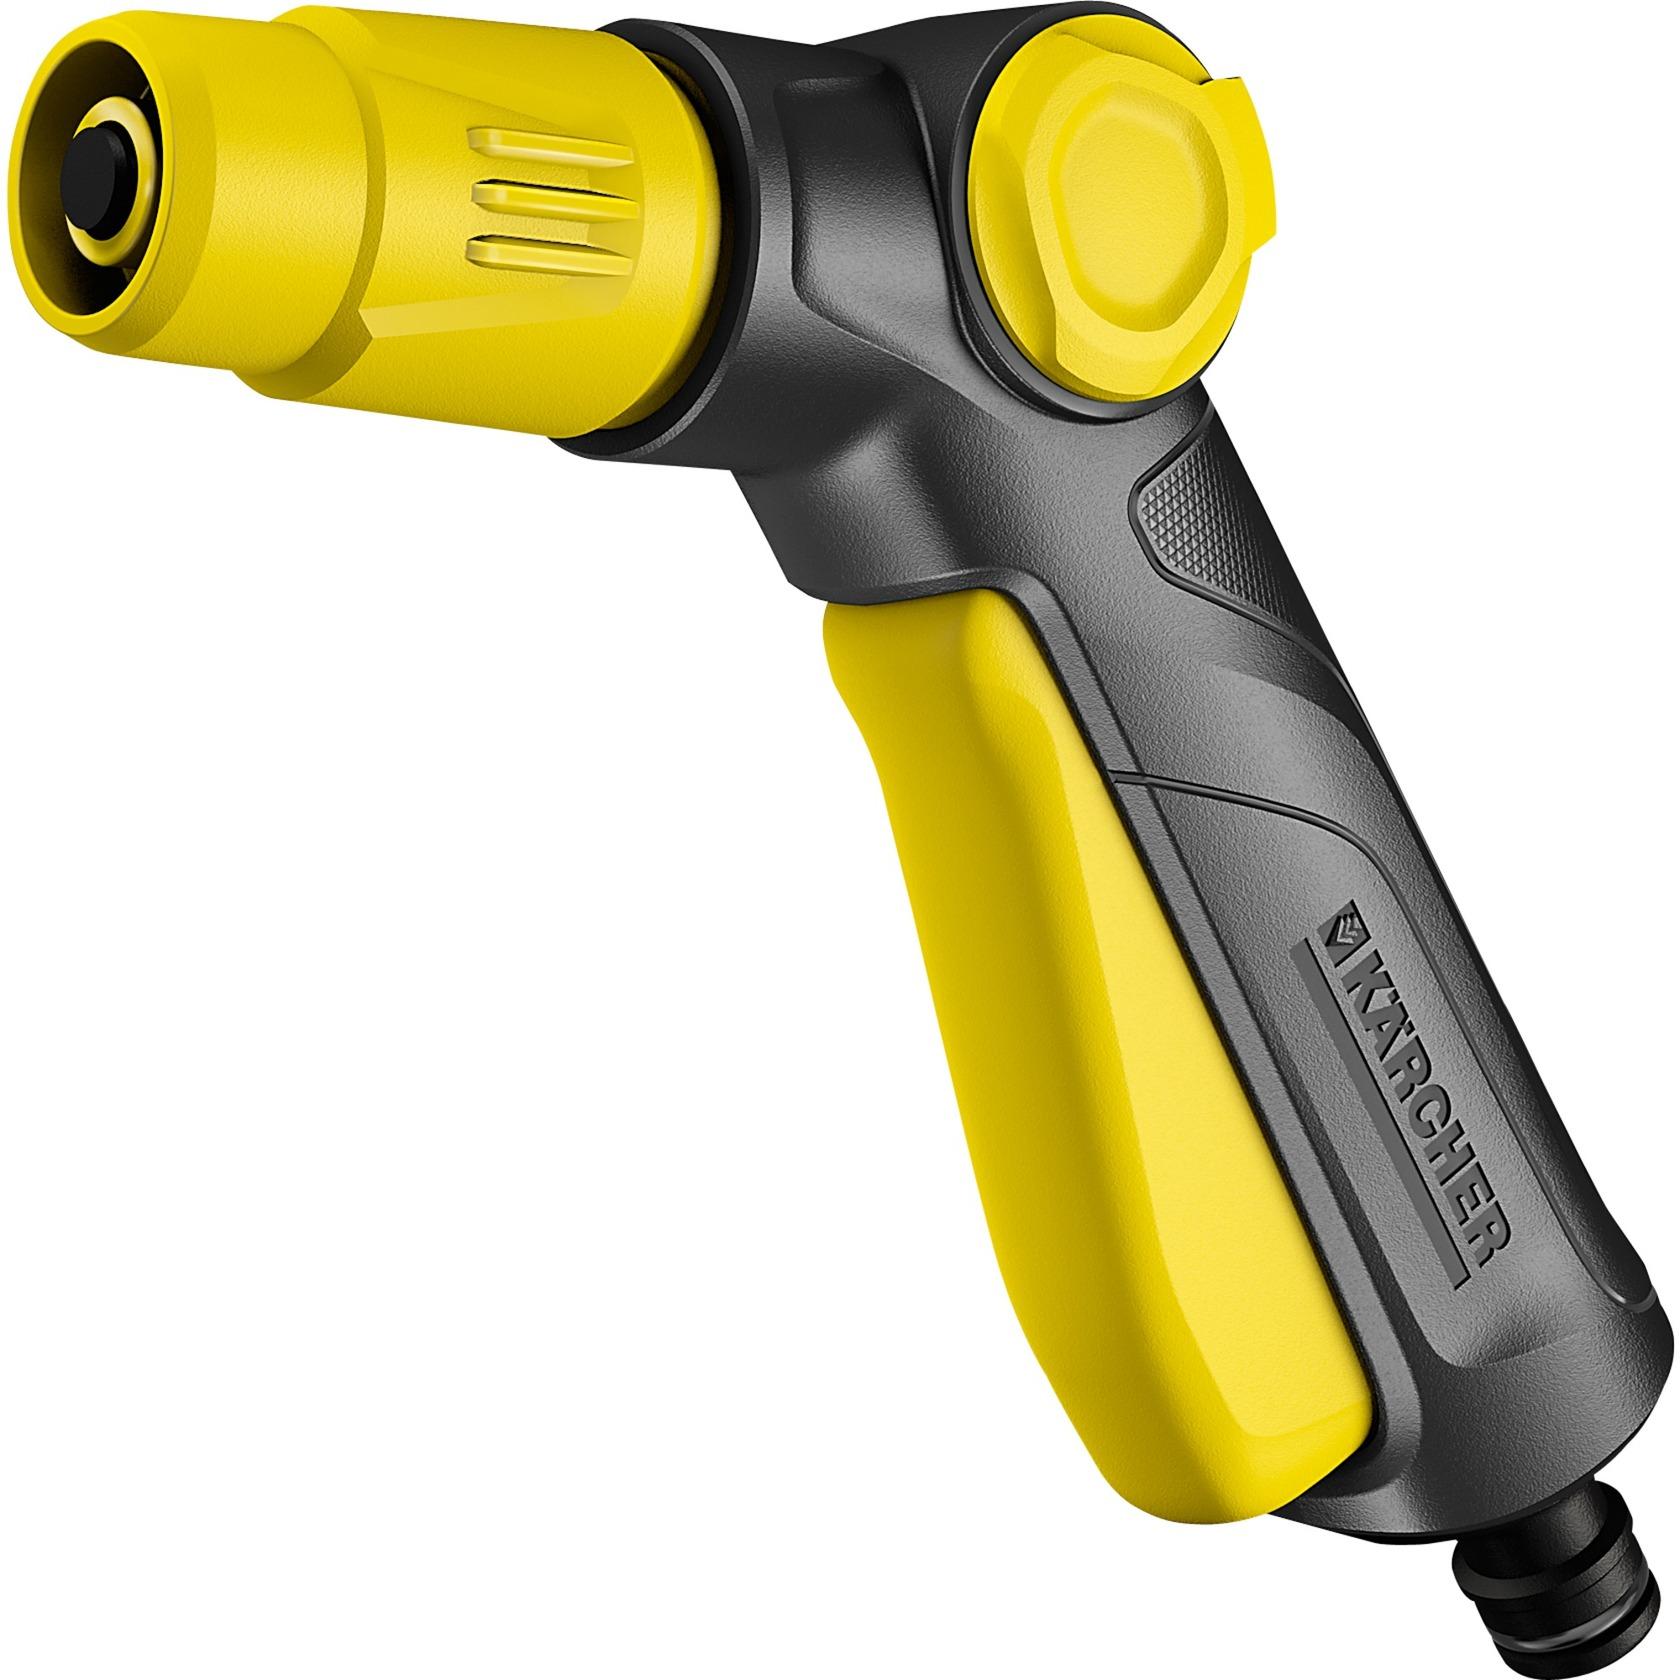 2.645-265.0 pistola de pulverización de agua o boquilla Pistola pulverizadora de agua para jardín Negro, Amarillo, Inyección